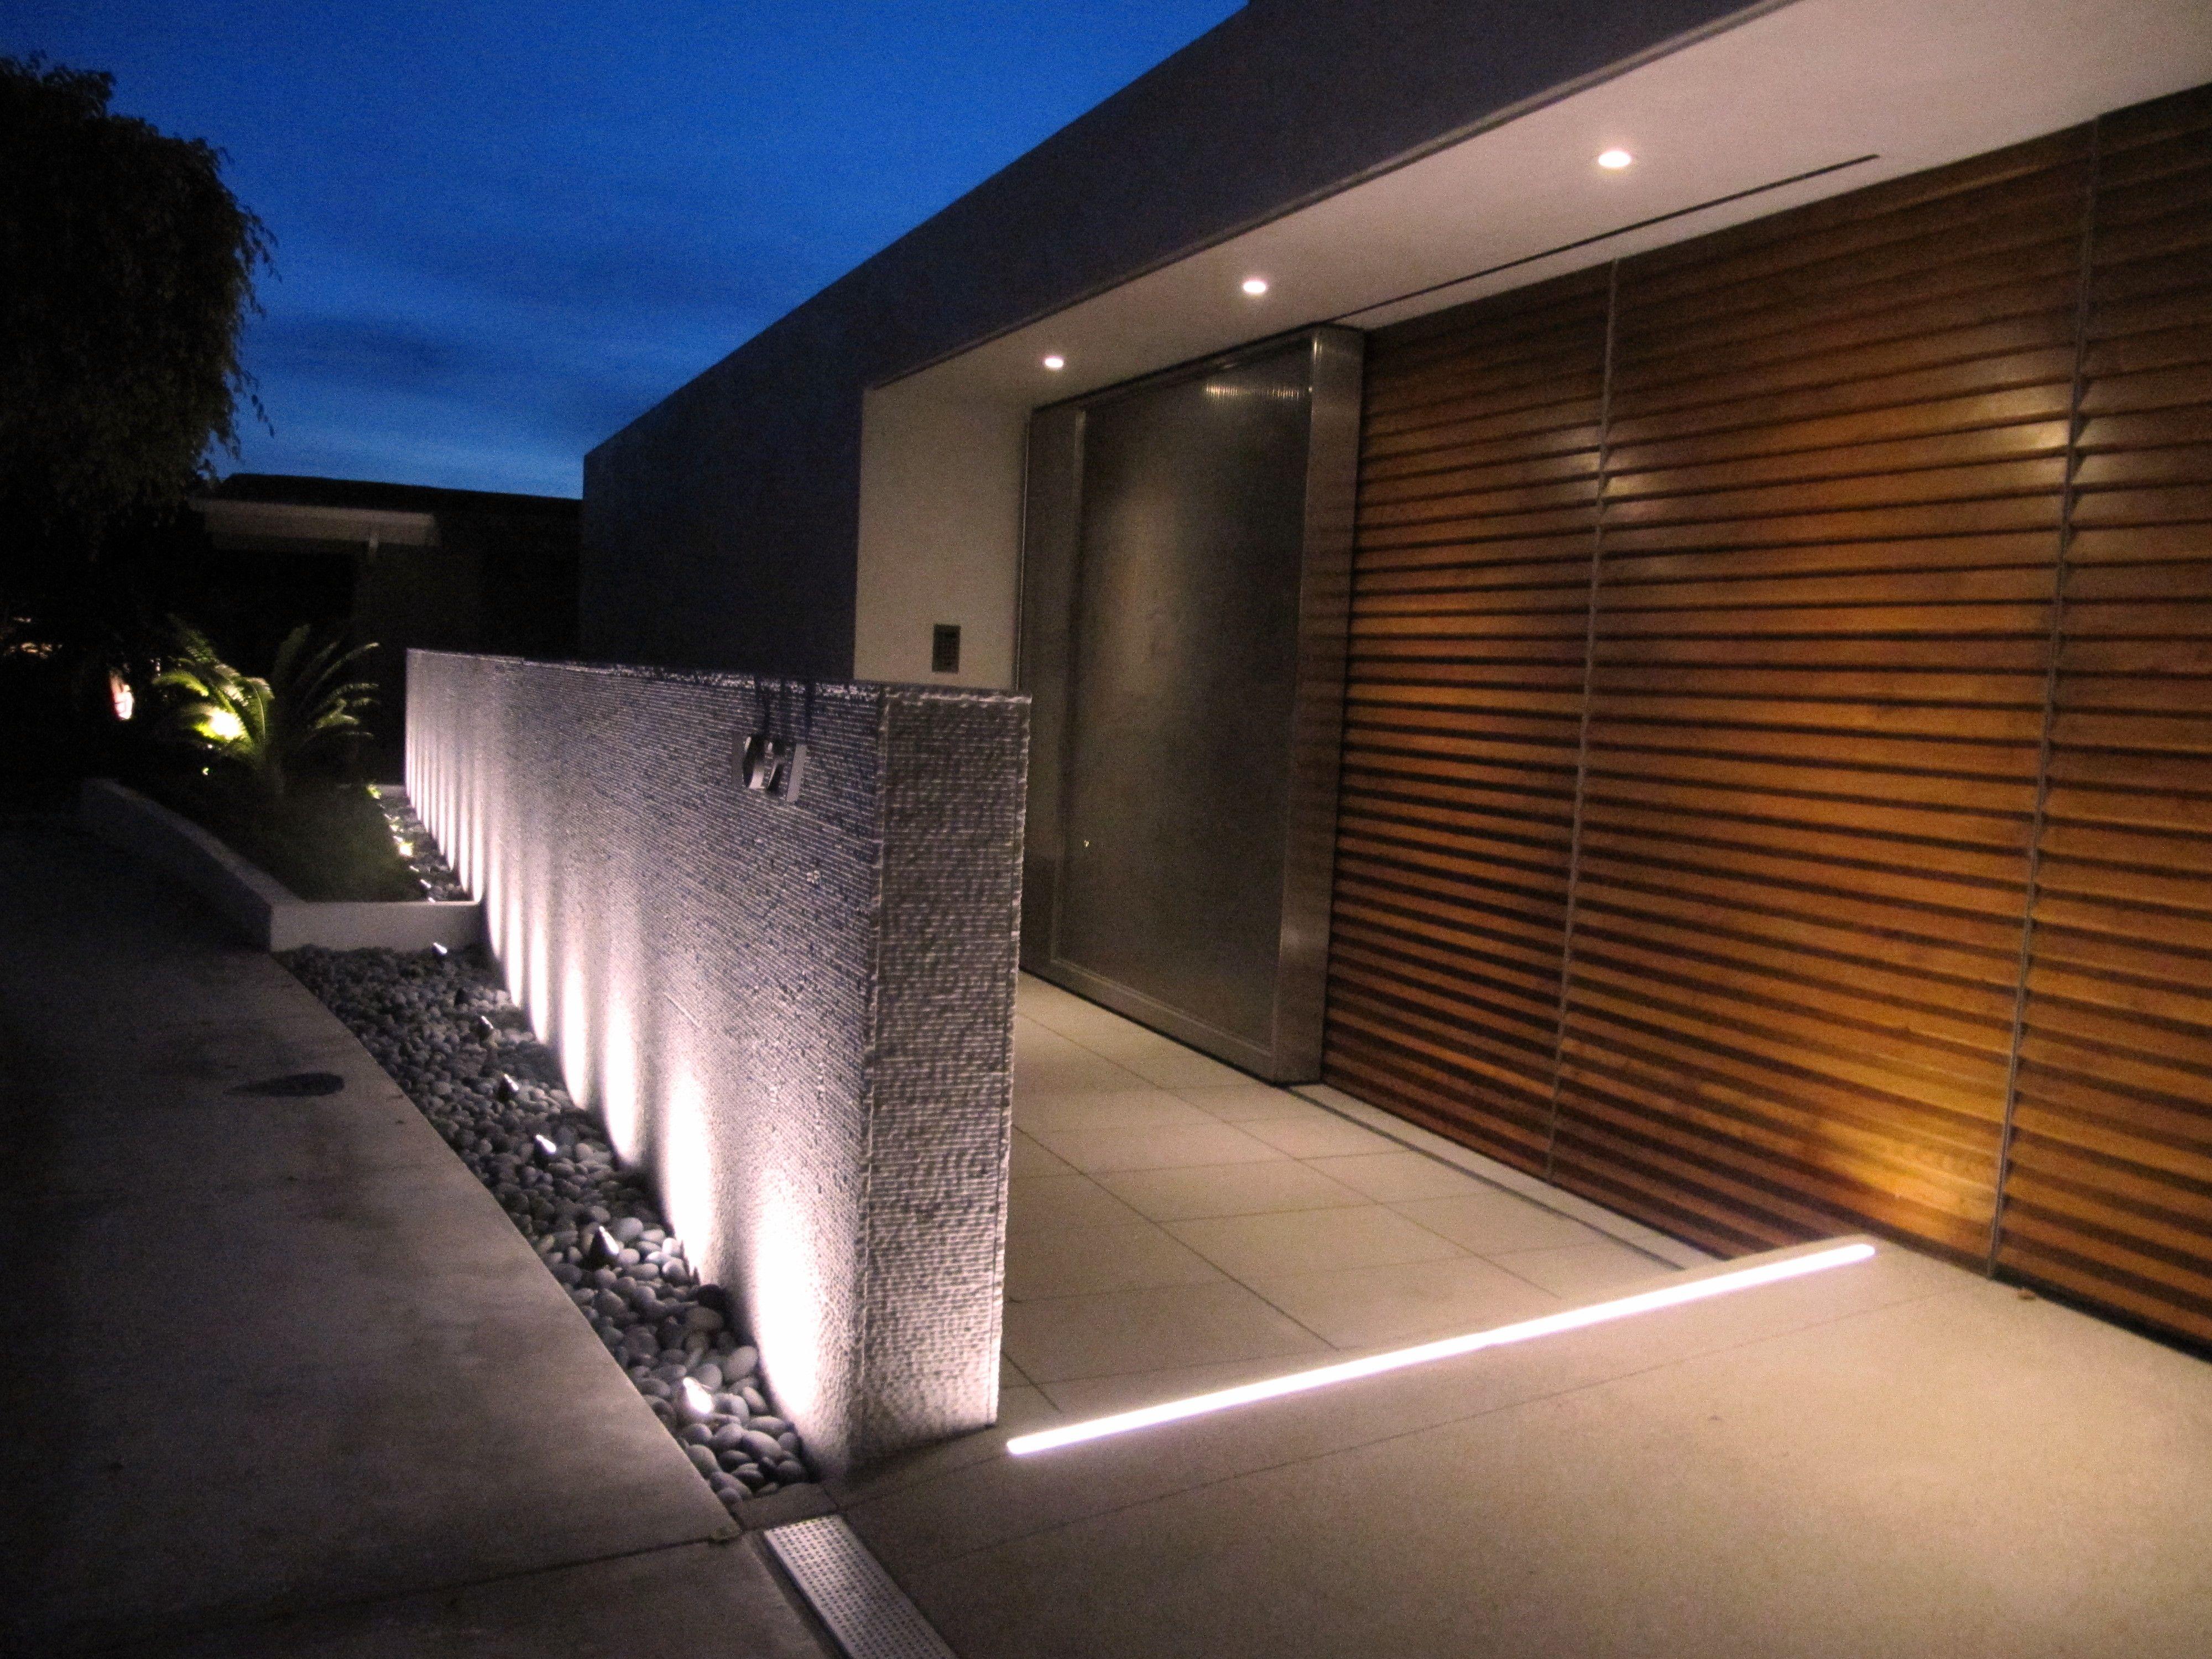 Residential 11b Architectural Lighting Design Garden Lighting Diy Exterior Lighting